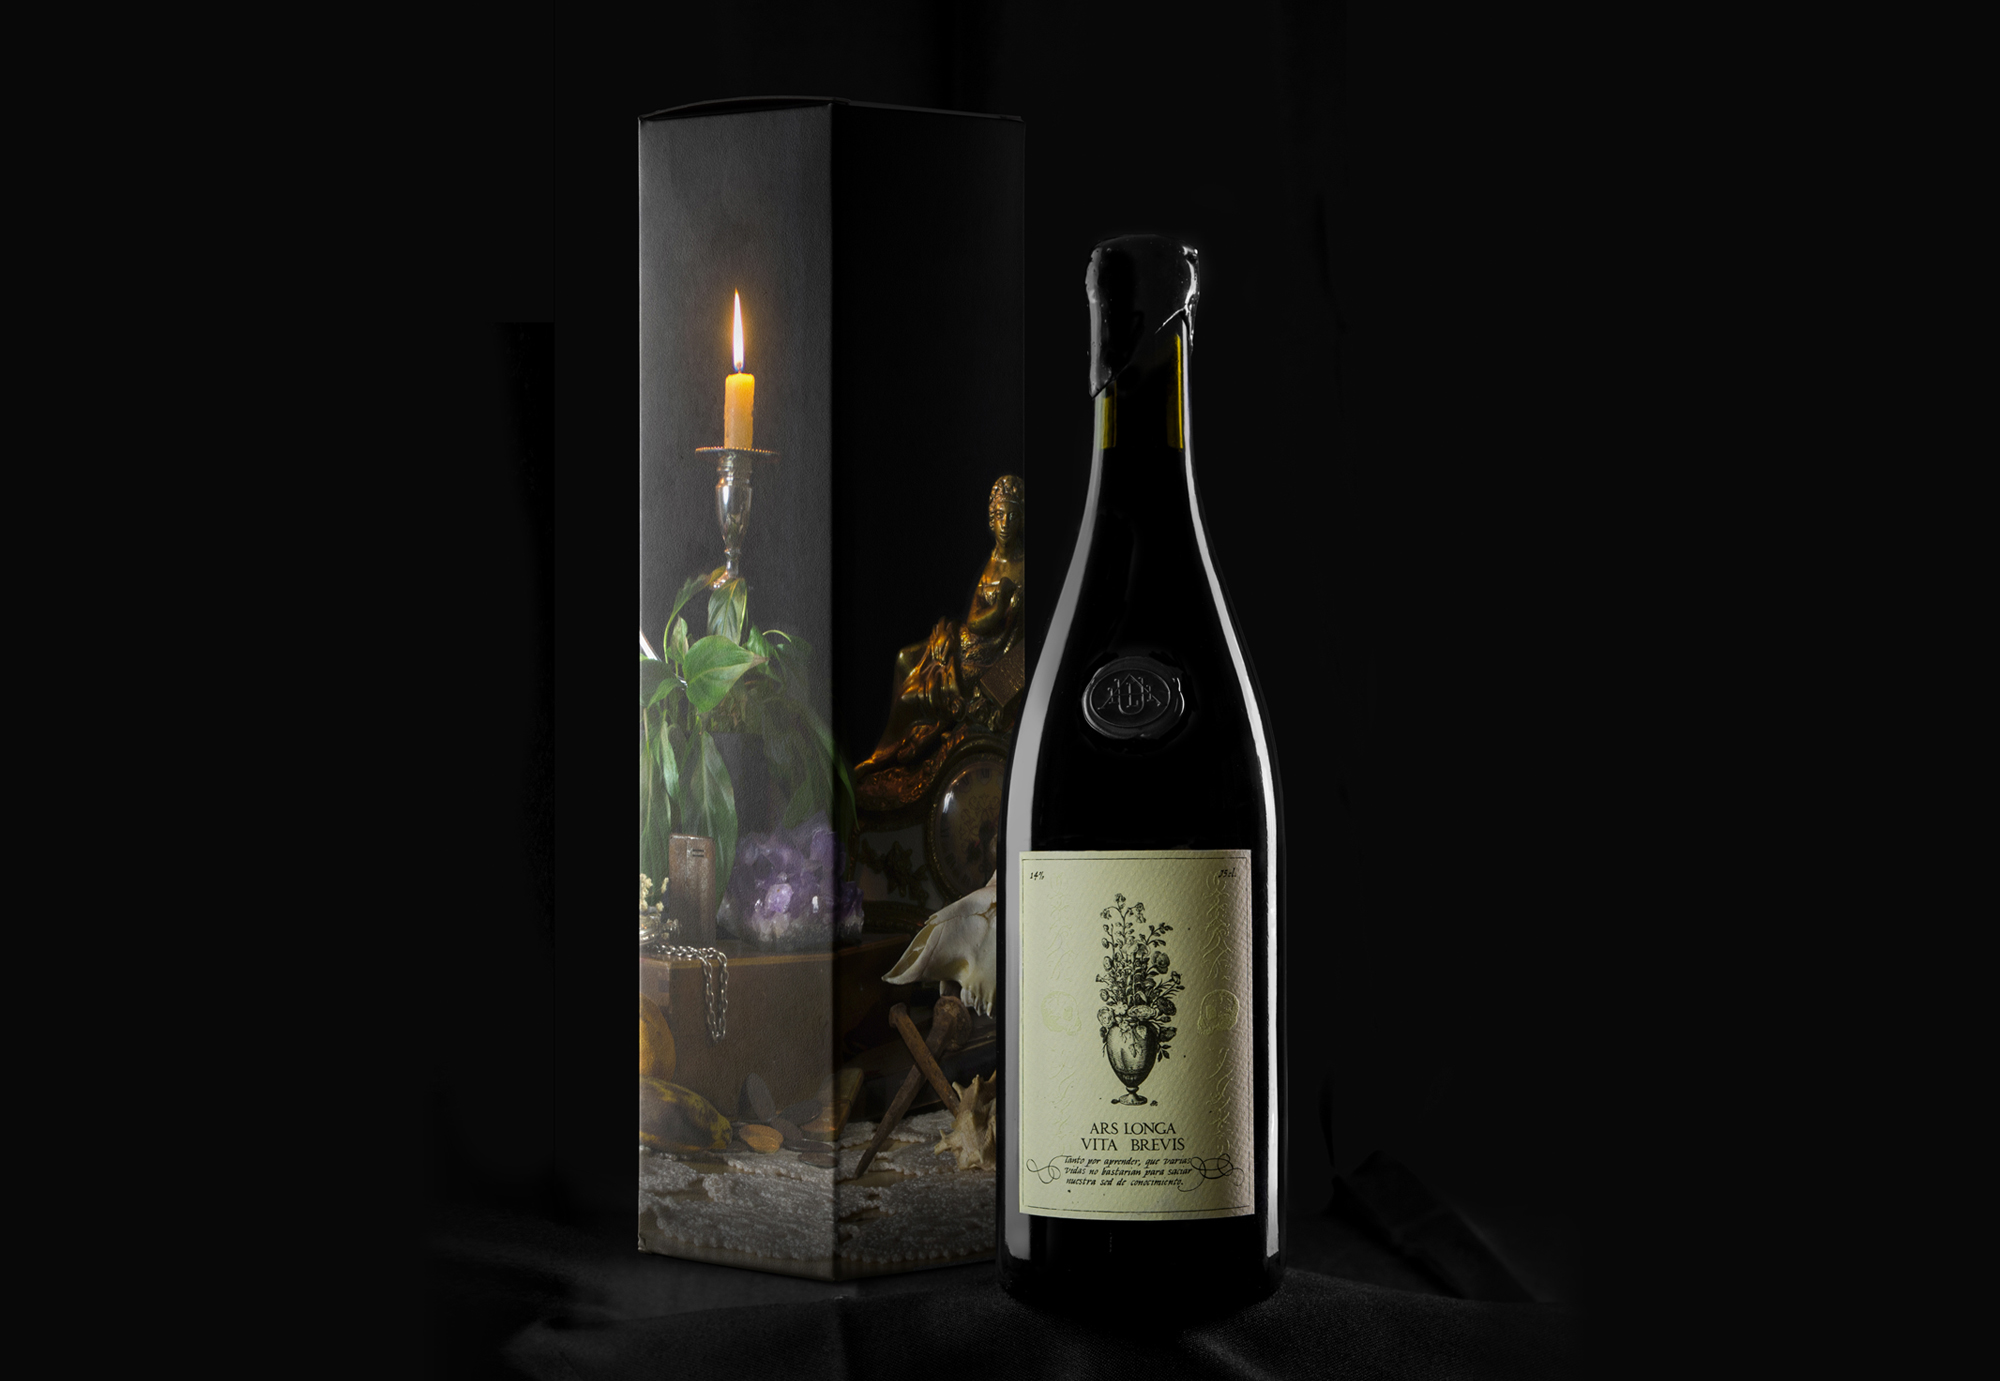 Diseño de caja y botella Ars Longa